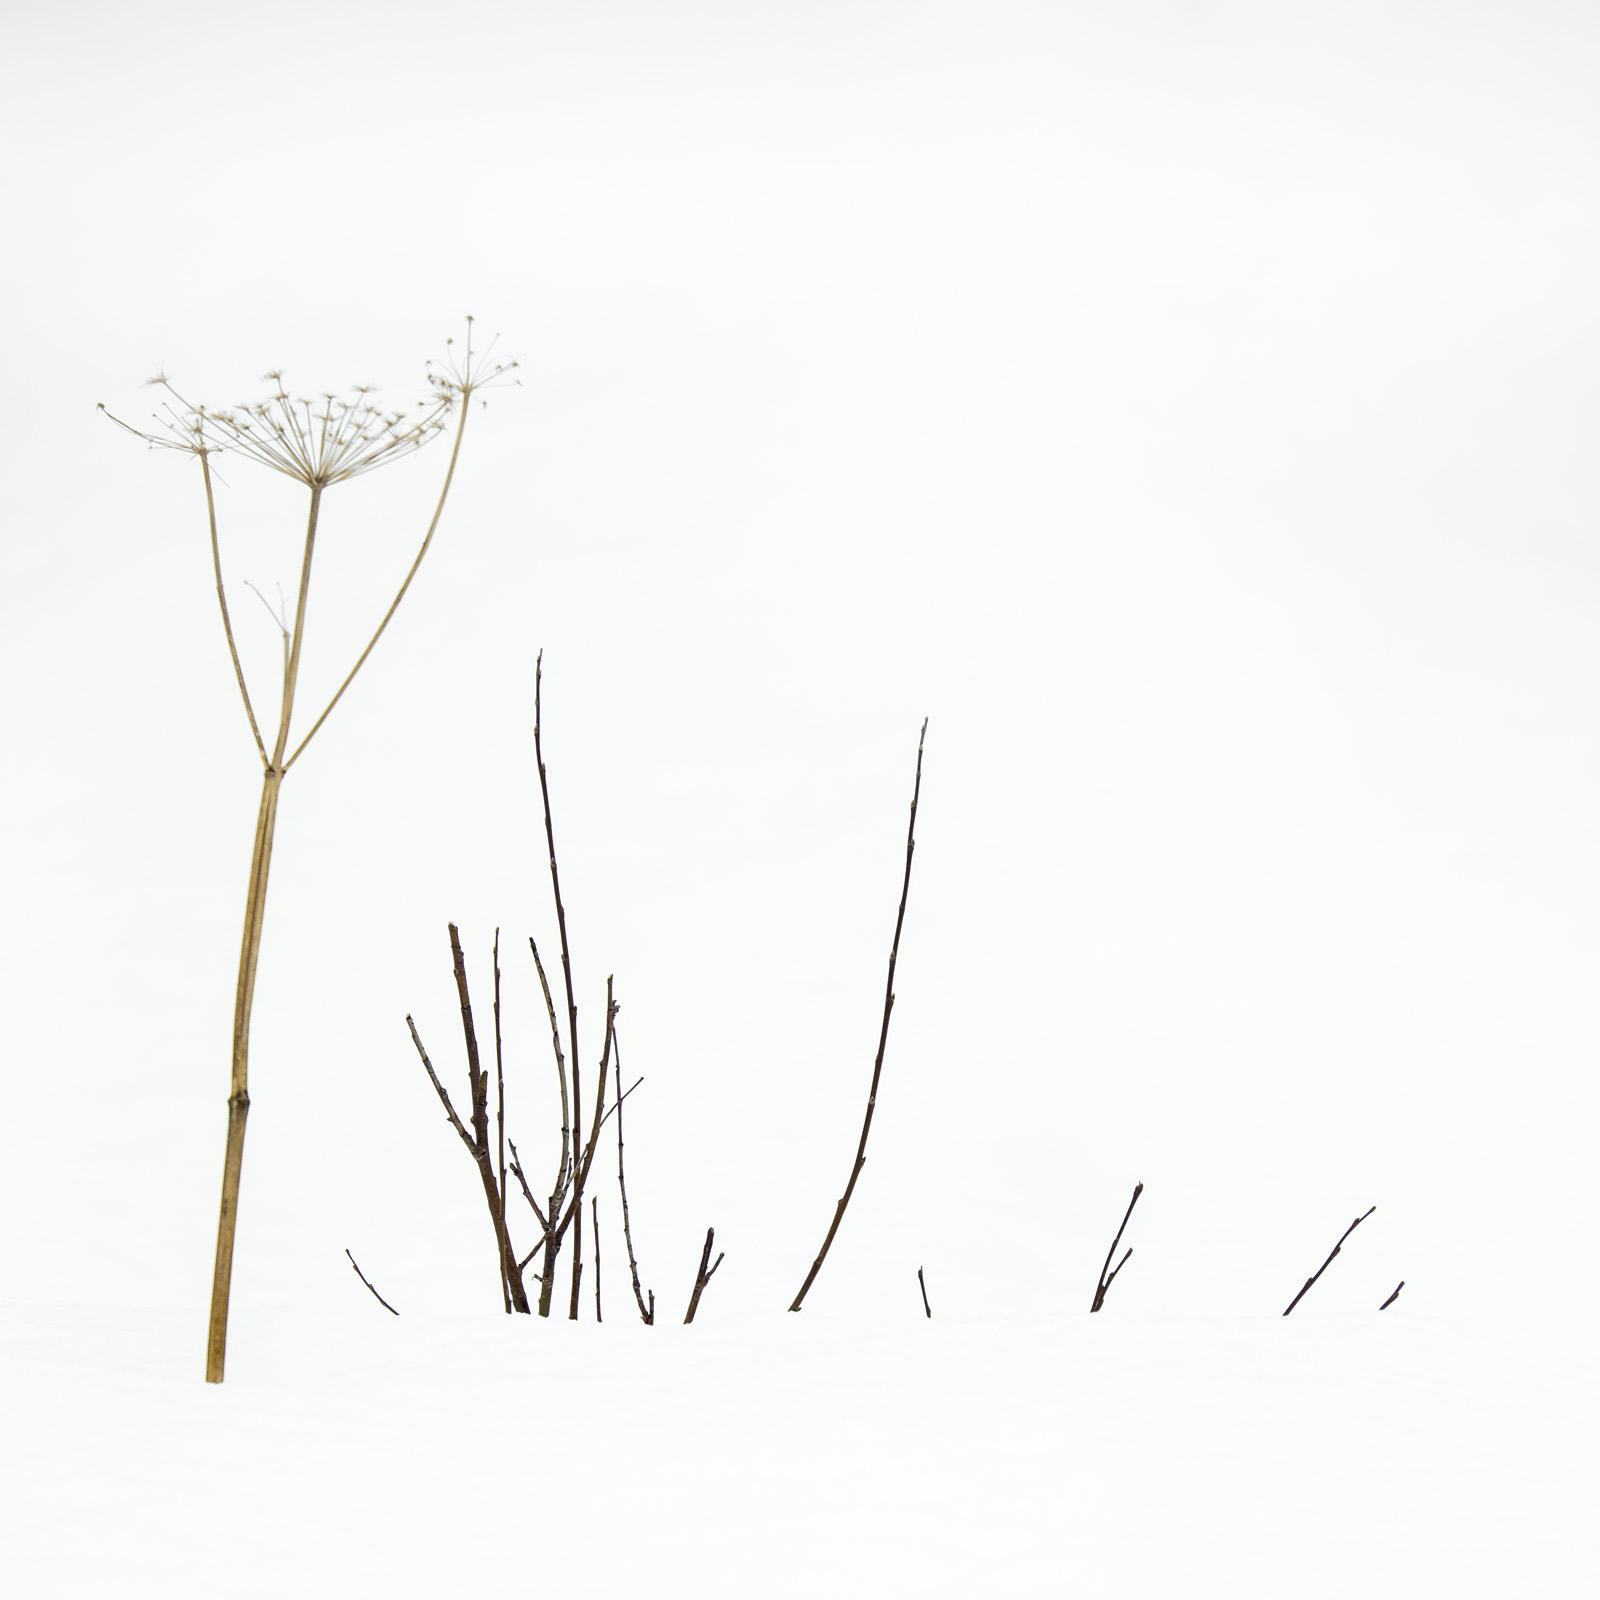 Dont Shoot, Ersfjord Bay, Senja, Norway, fun, seed head, grass, hands up, blonde, Afro, high key, minimalist, stark, photo